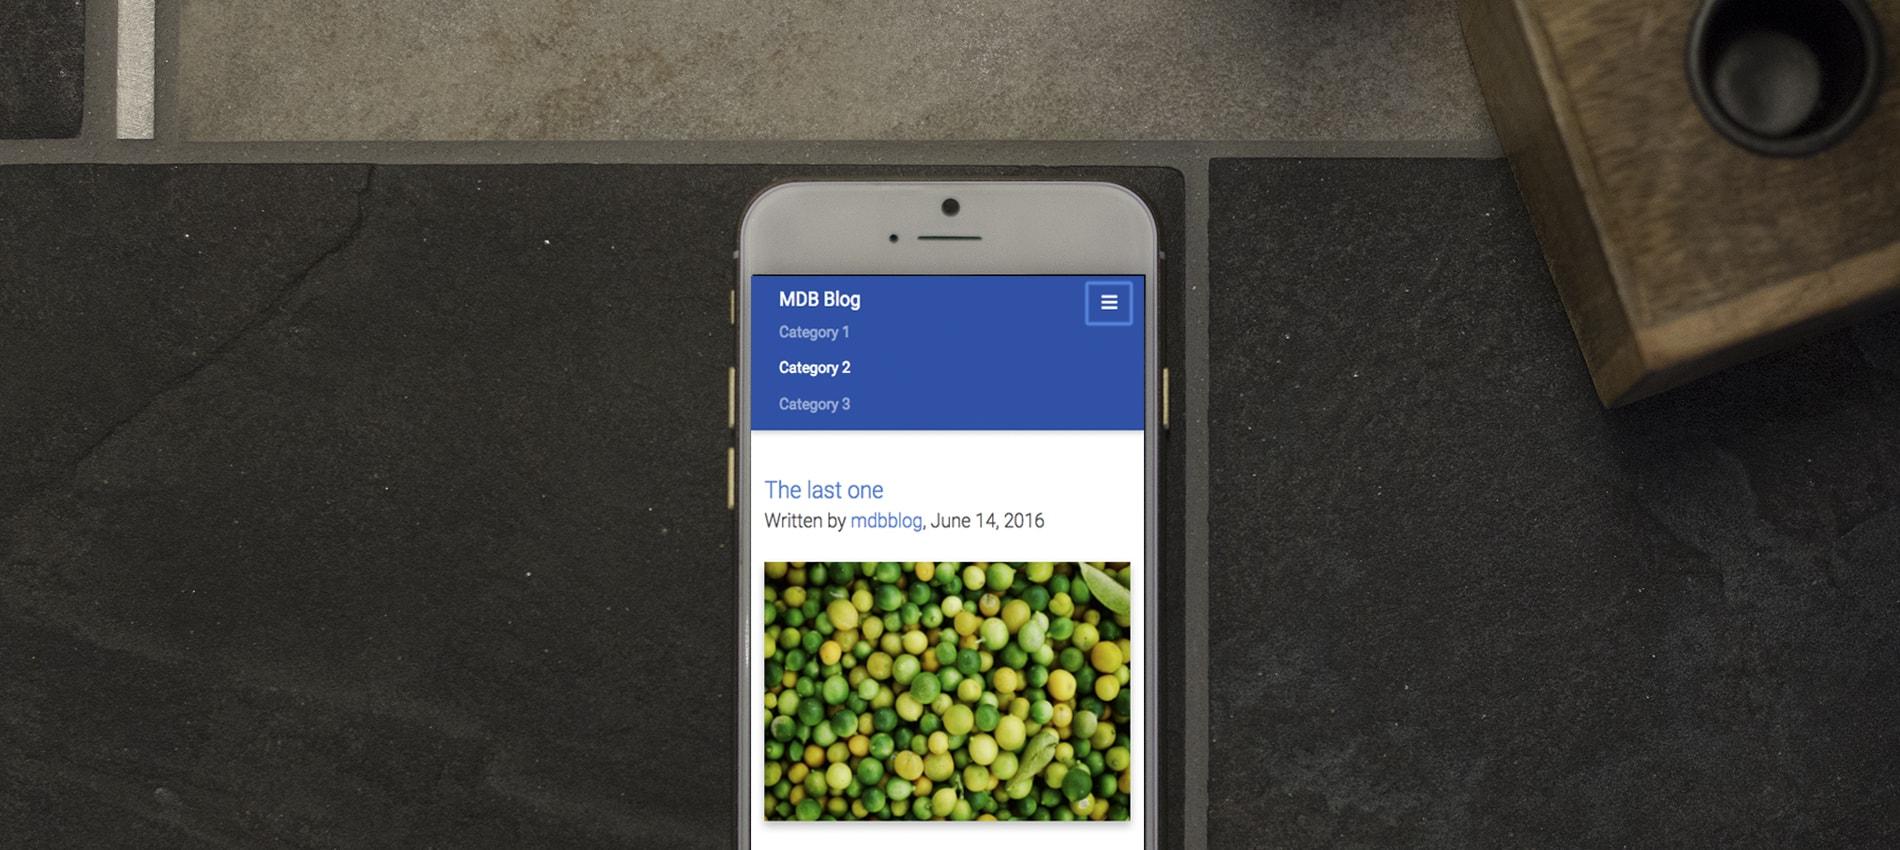 MDB navbar displayed on iPhone